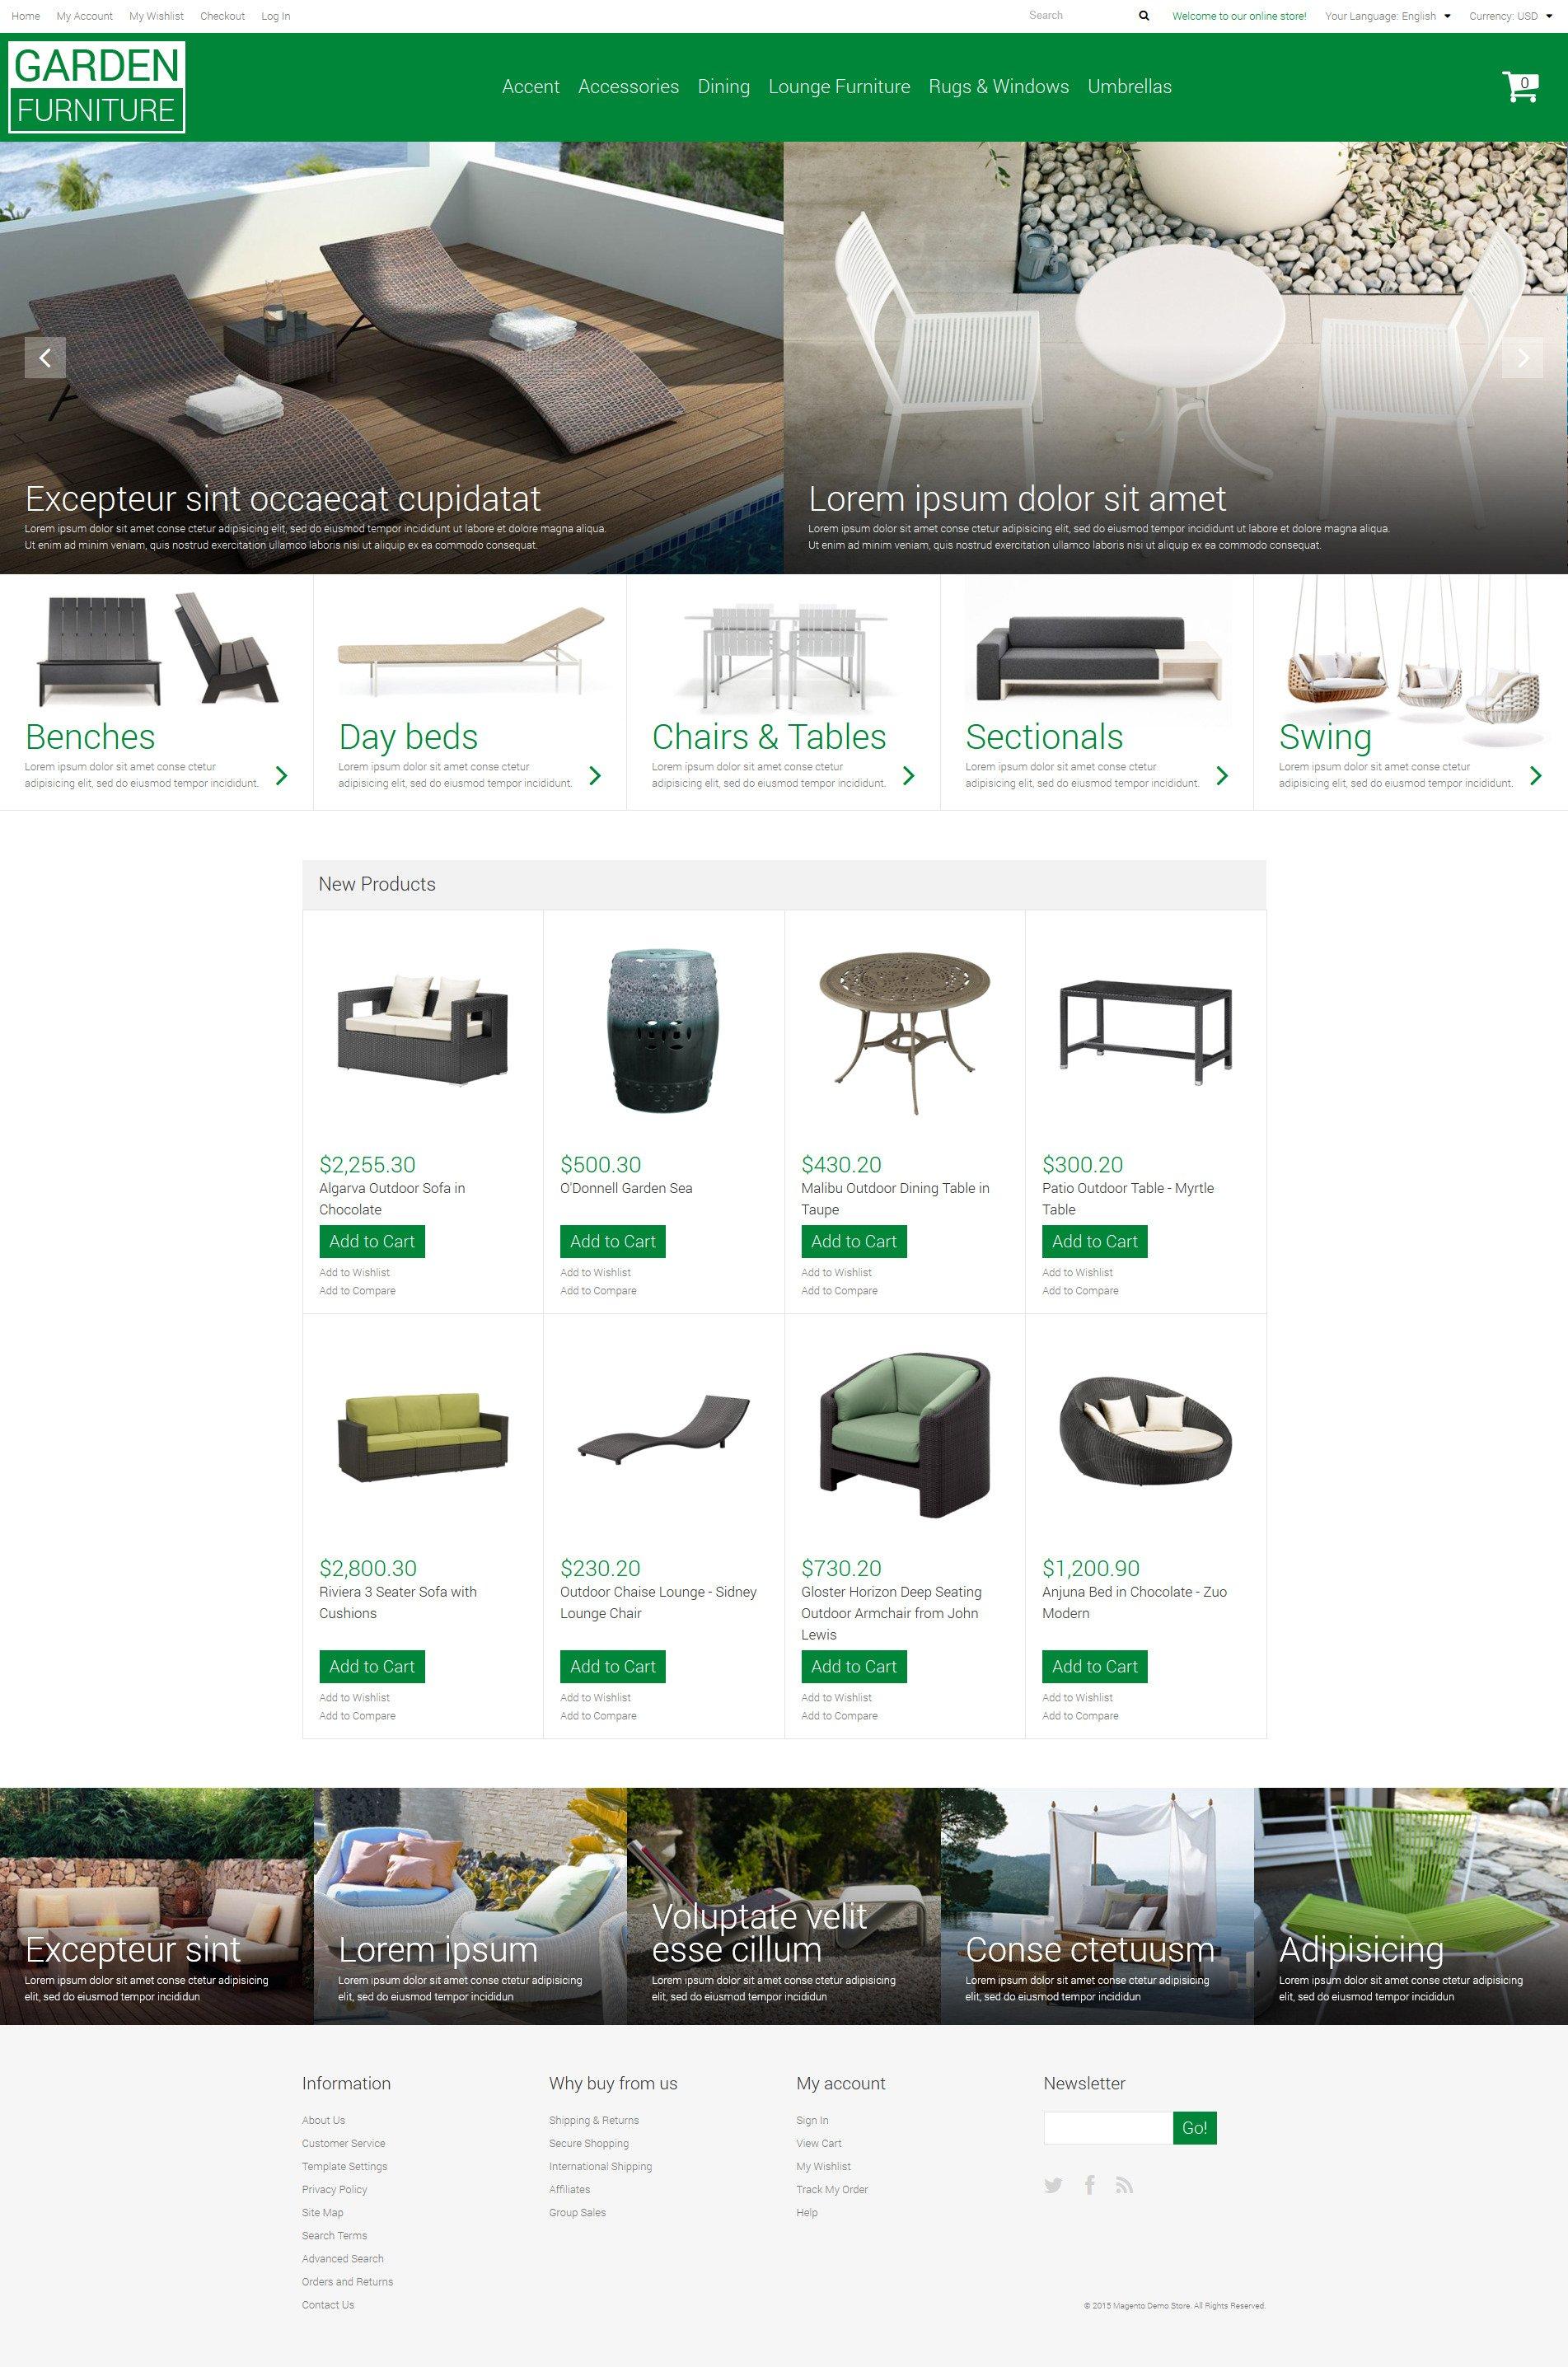 Garden furniture sheds magento theme 53424 garden furniture sheds magento theme maxwellsz